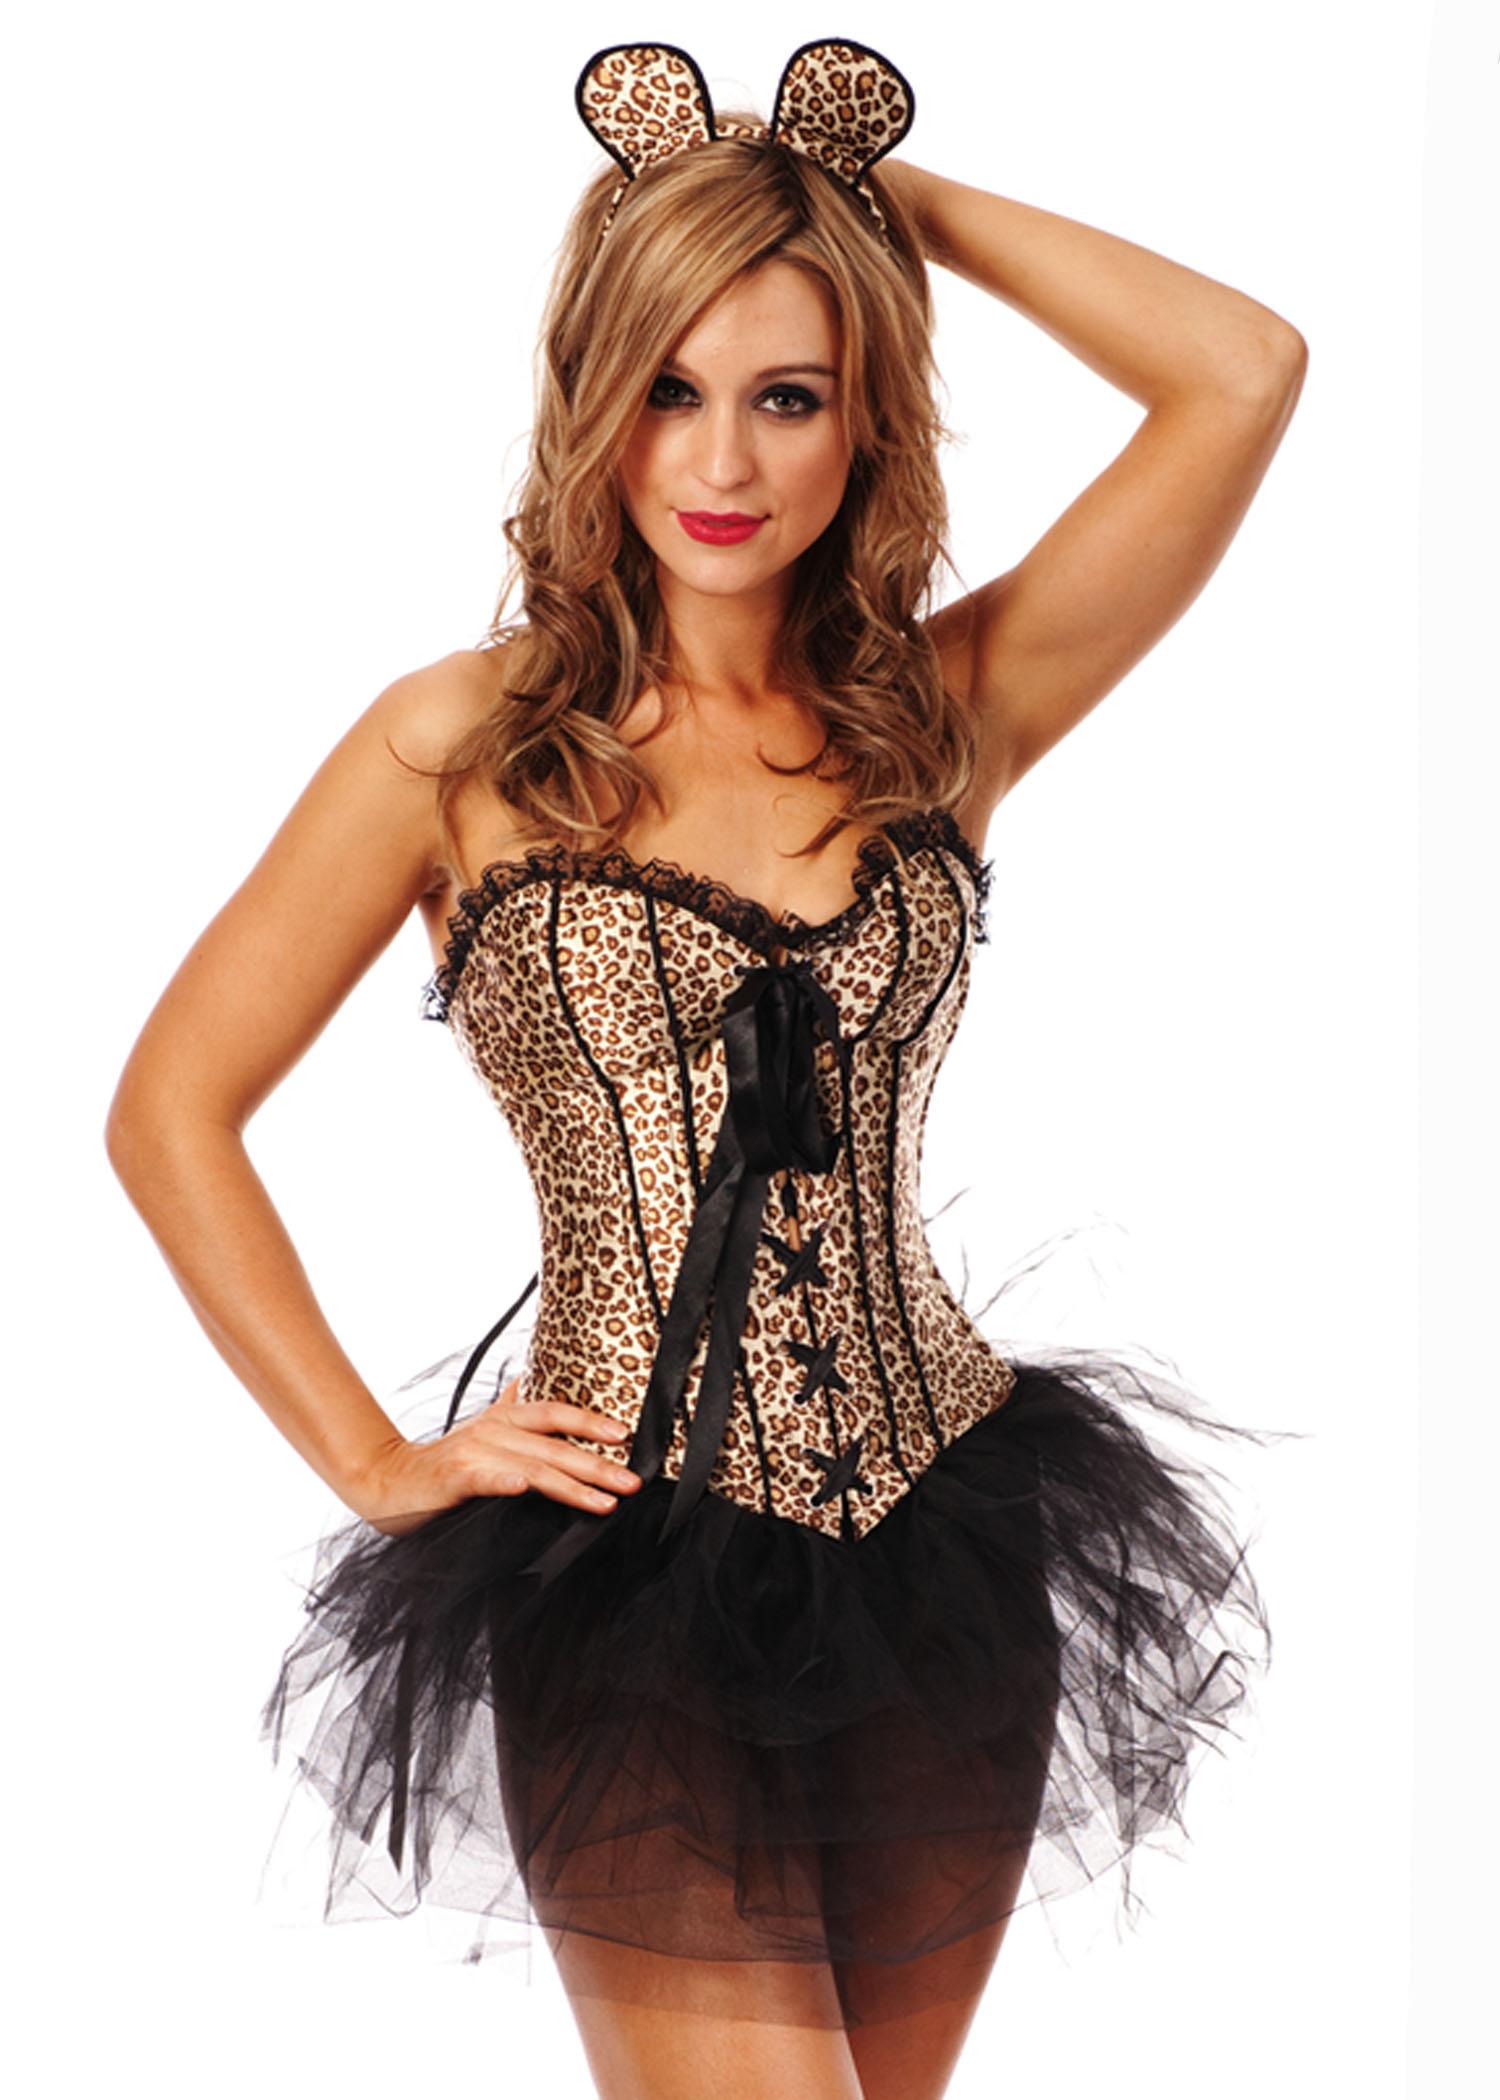 Ladies Cheshire Cat Costume Leopard Corset Fancy Dress UP Burlesque Tutu